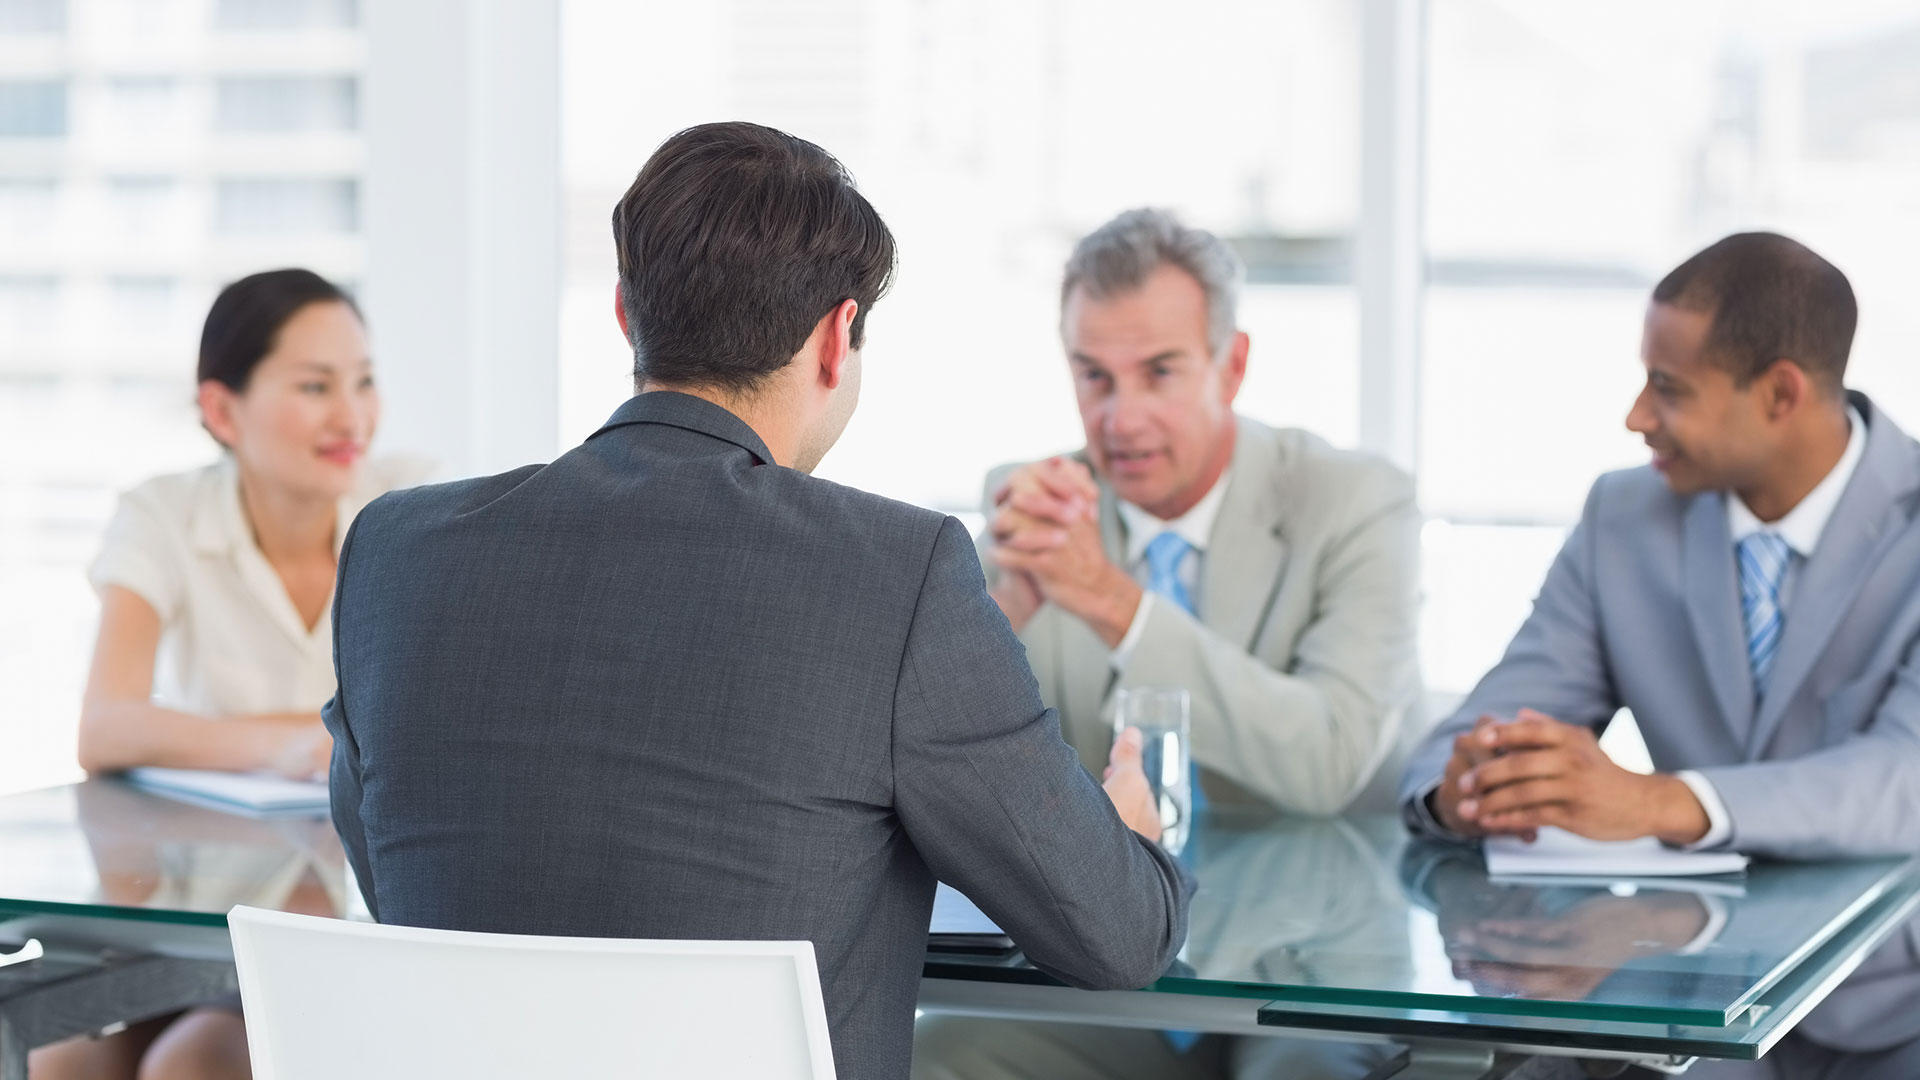 Man talking with human resource representatives